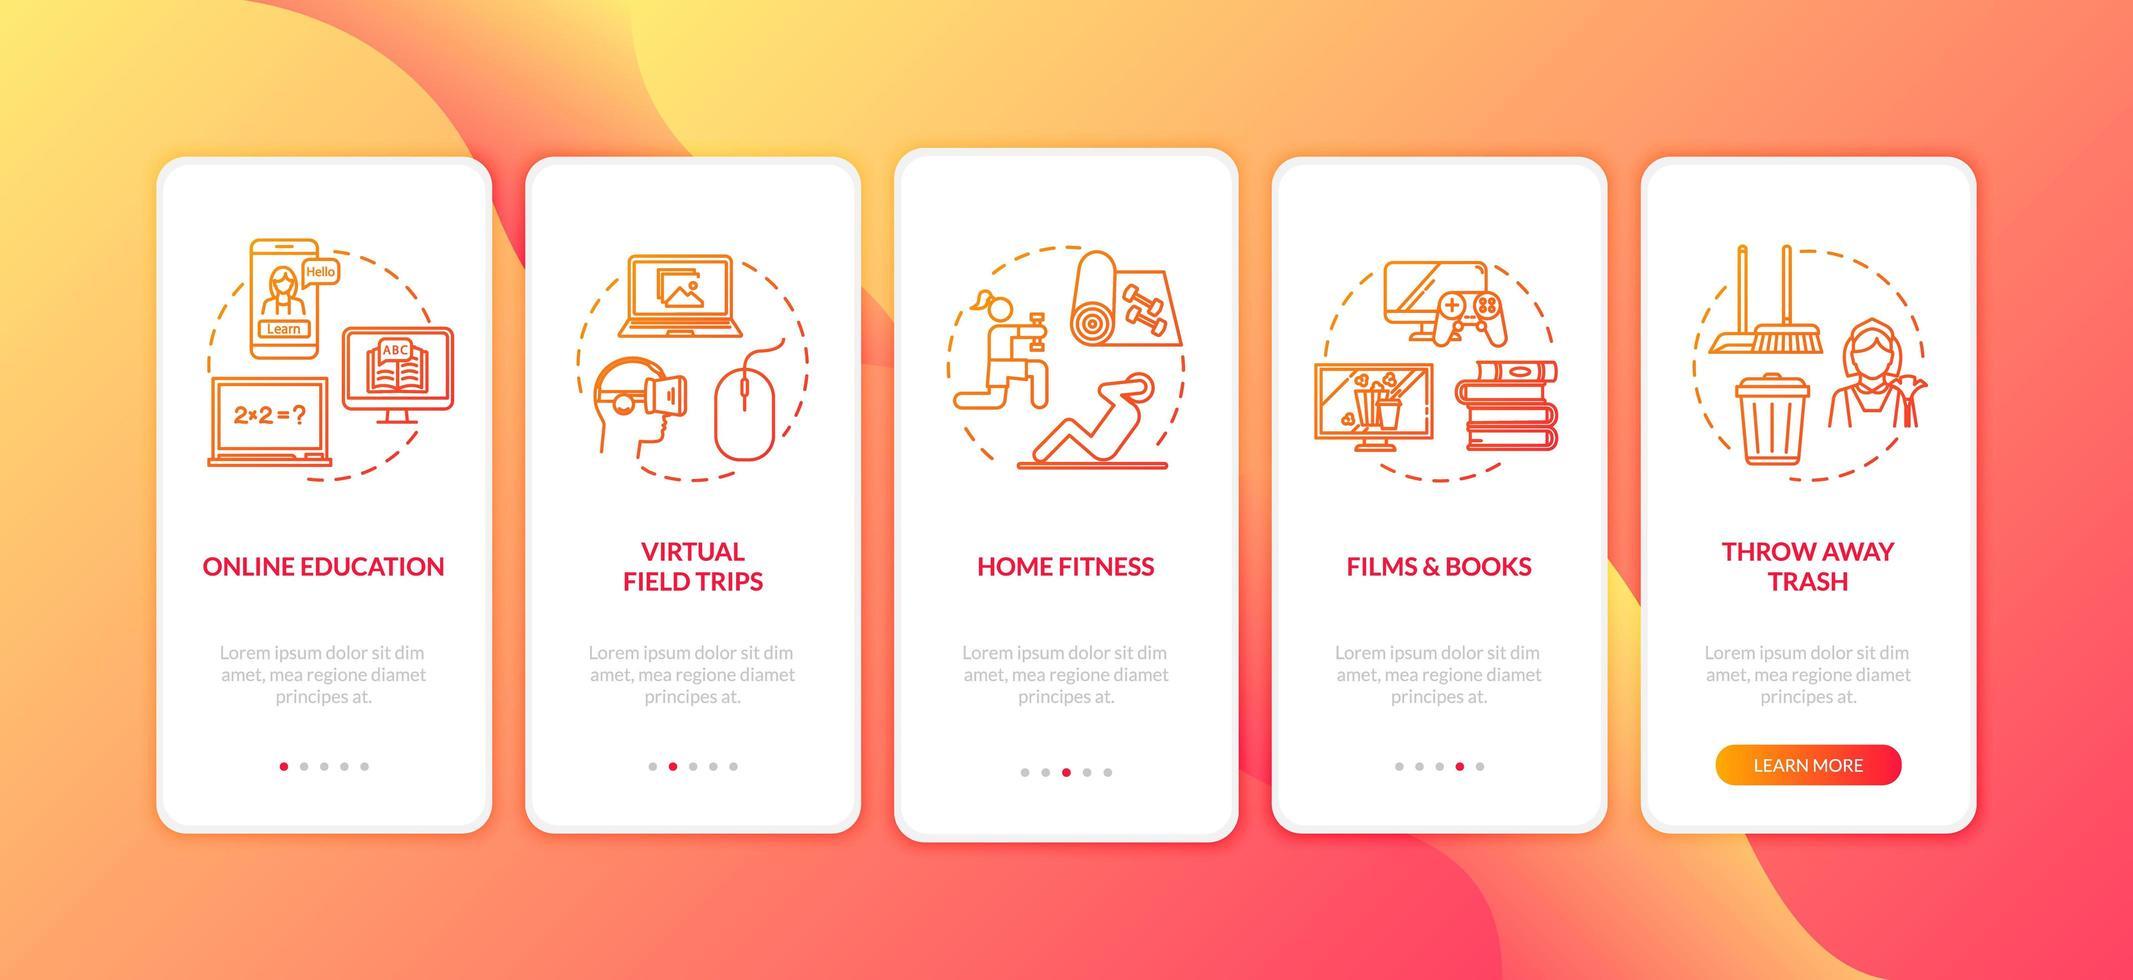 hemaktivitet, fritid och e-learning ombord mobil sida vektor